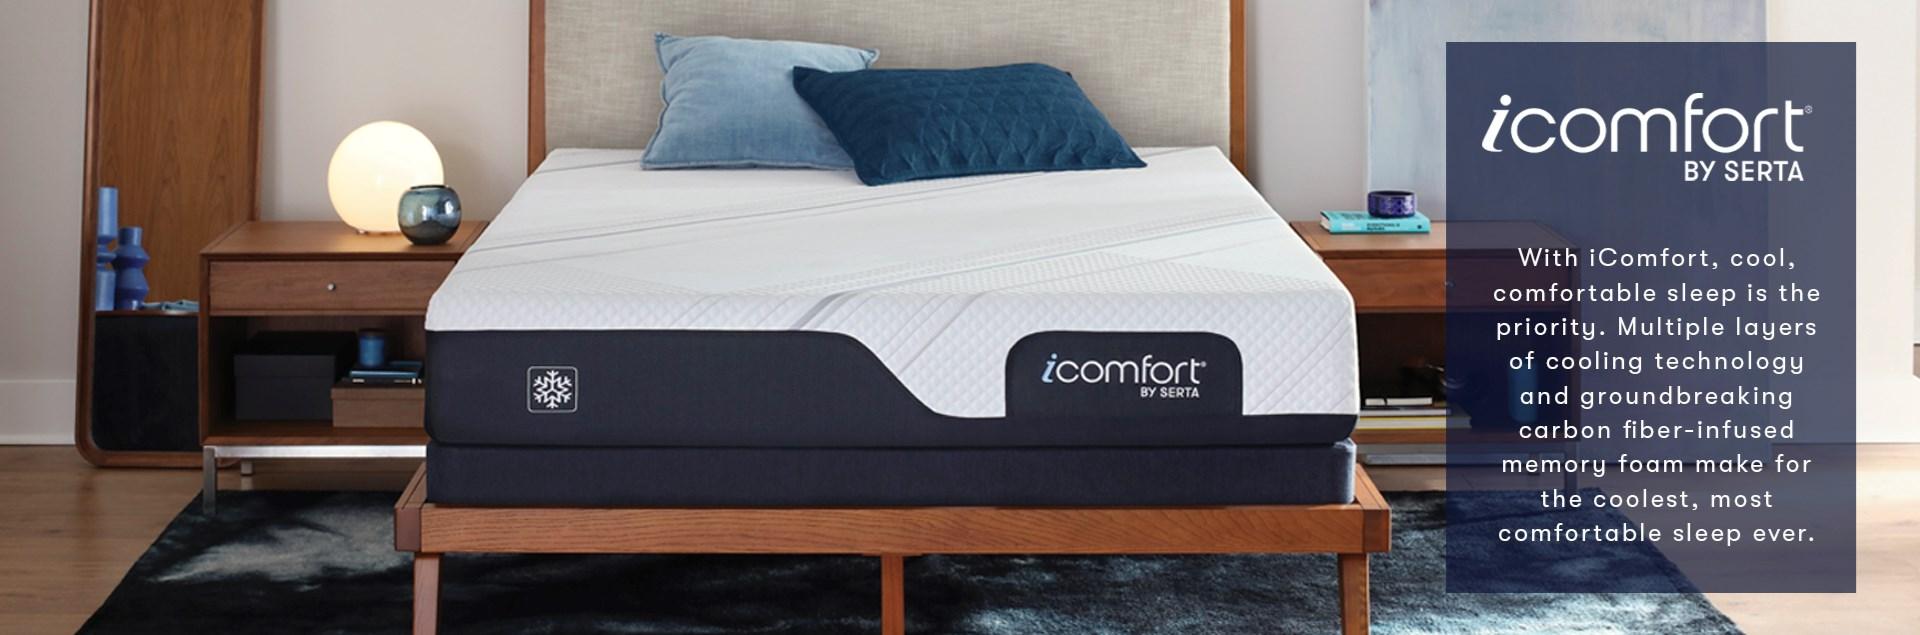 Ultimate Mattress Image comfort